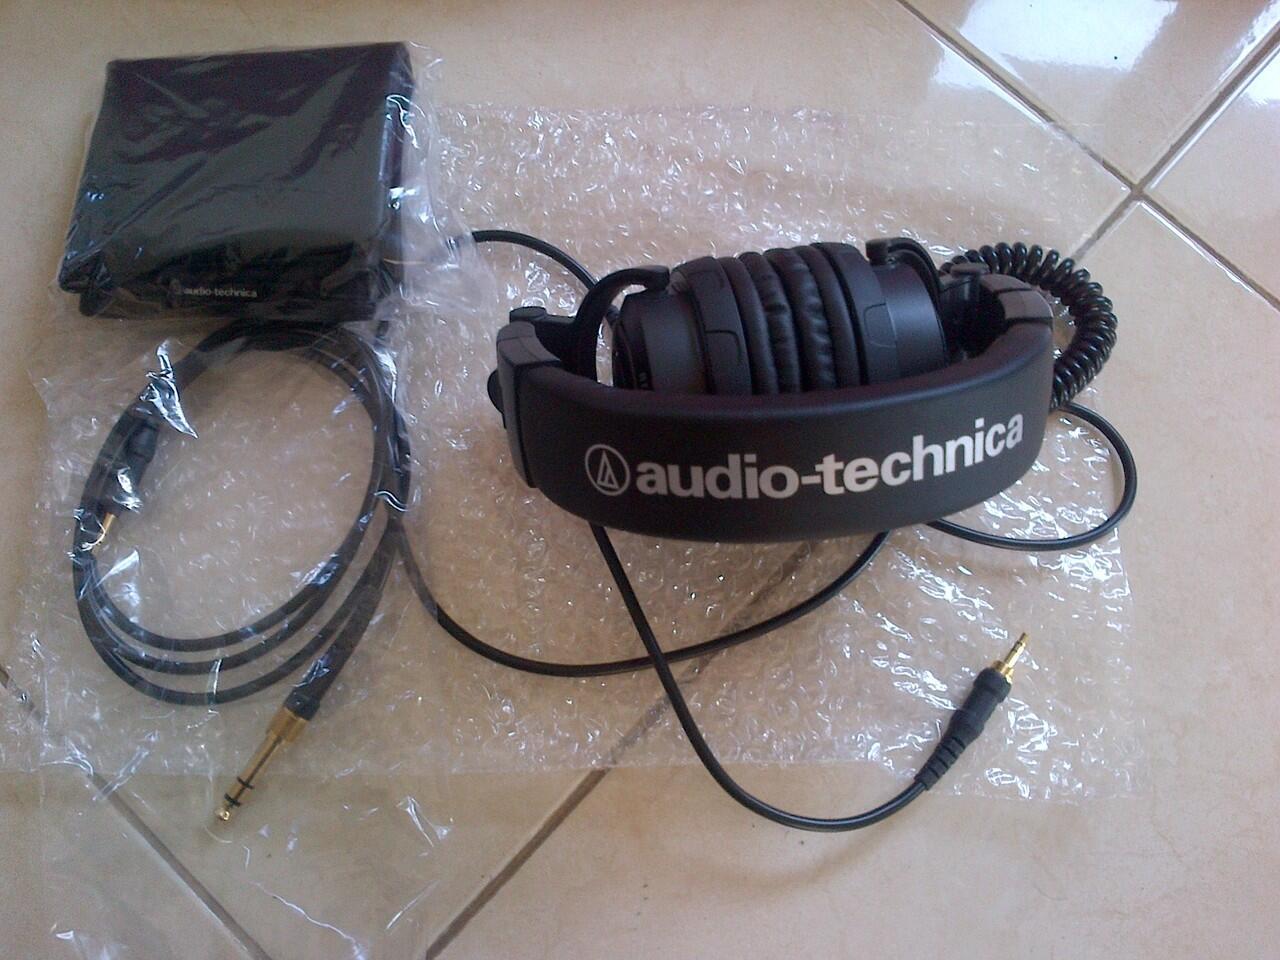 Jual audio technica ath pro 500 MK II